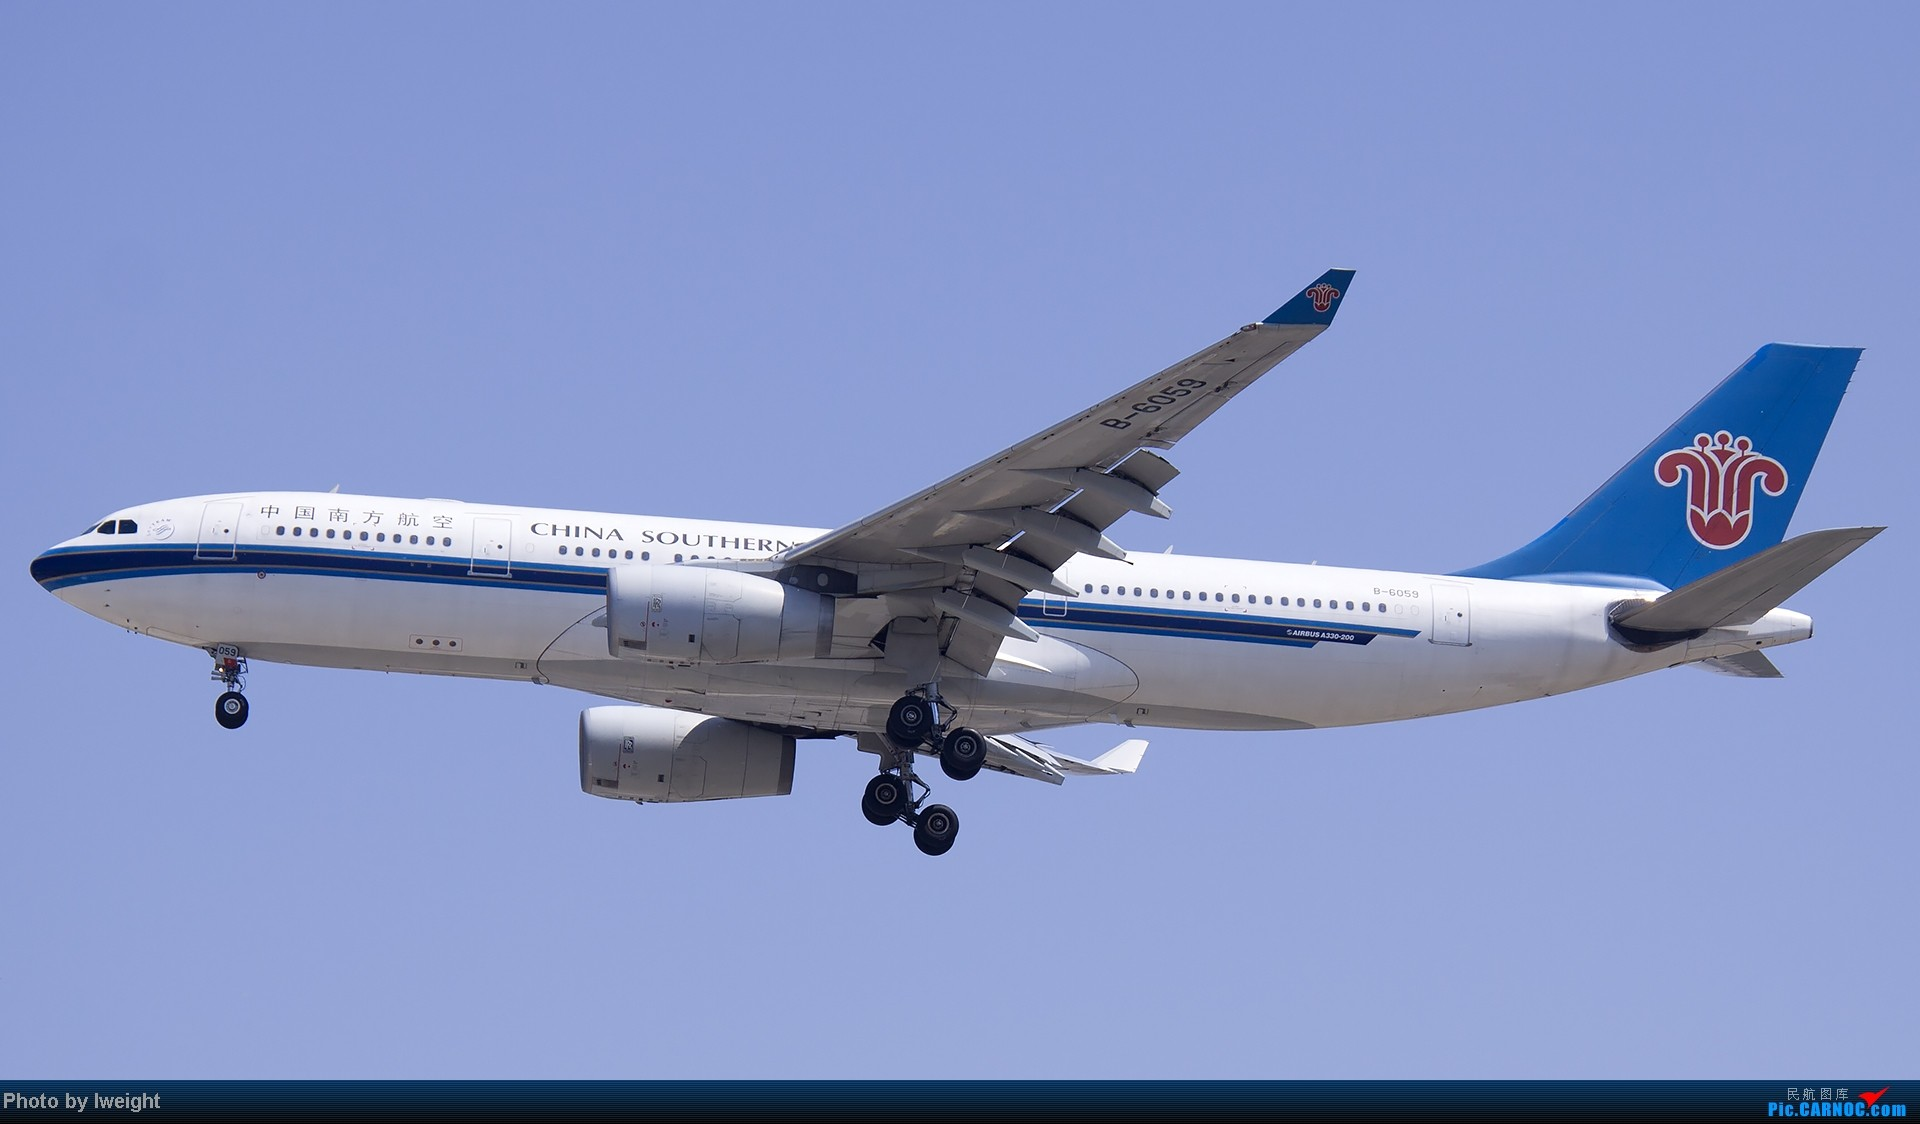 Re:[原创]北京难得的好天气,收获多种机型和彩绘,遗憾的是再次错过卡航巴塞罗那彩绘 AIRBUS A330-200 B-6059 中国北京首都机场